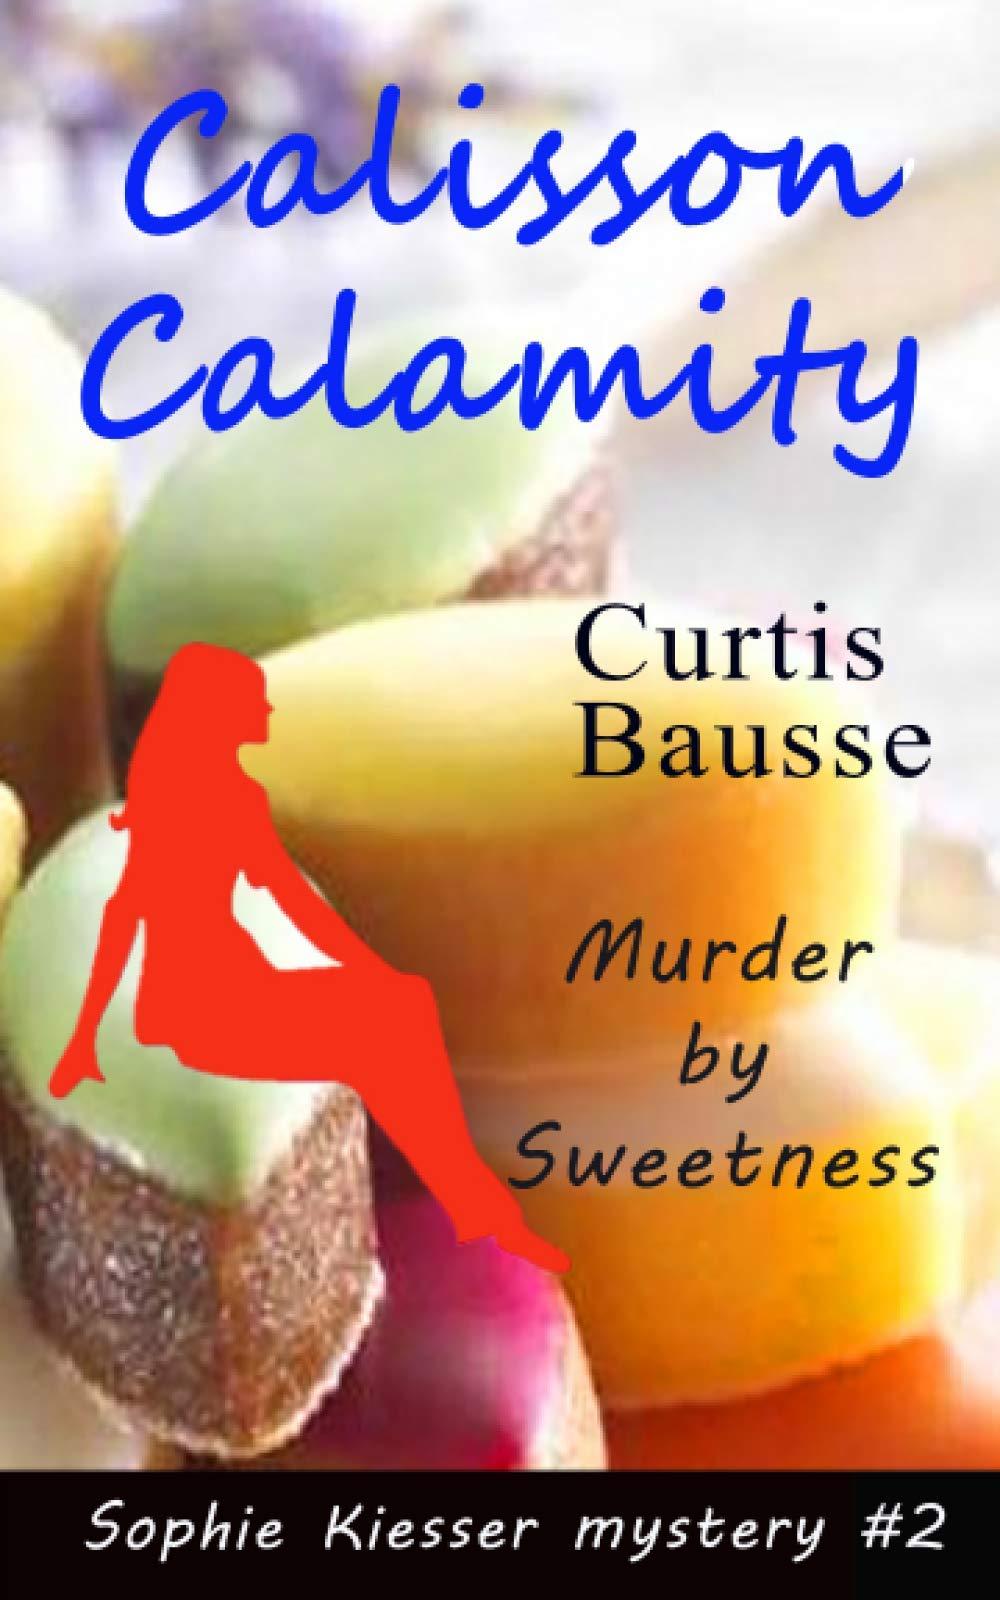 Calisson Calamity: Murder by Sweetness (Sophie Kiesser mystery series)